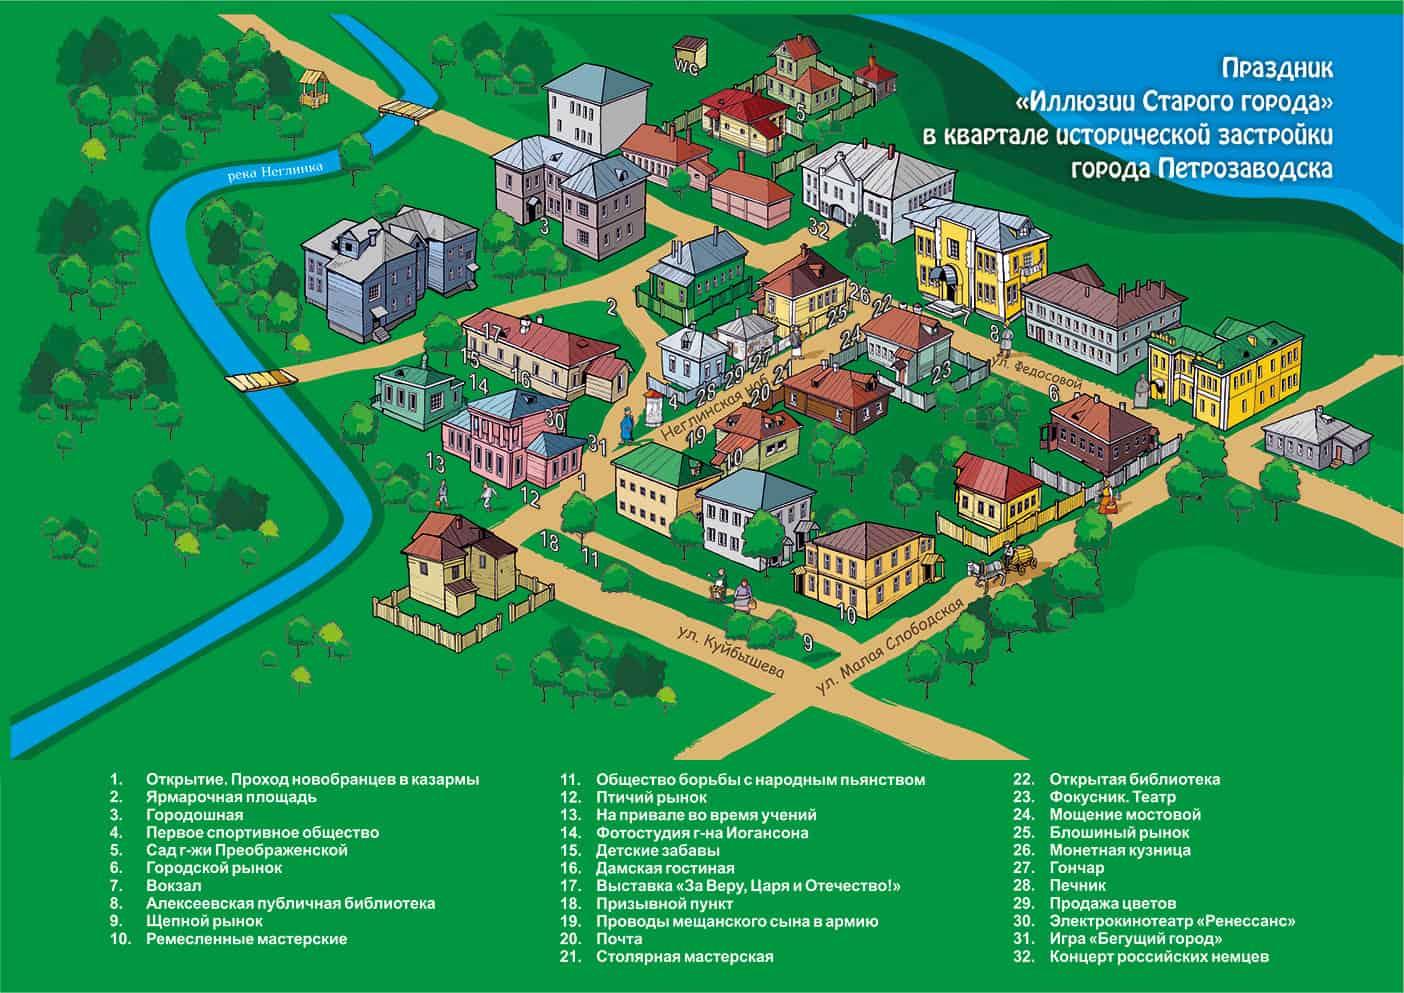 «Иллюзии Старого города». Программа праздника